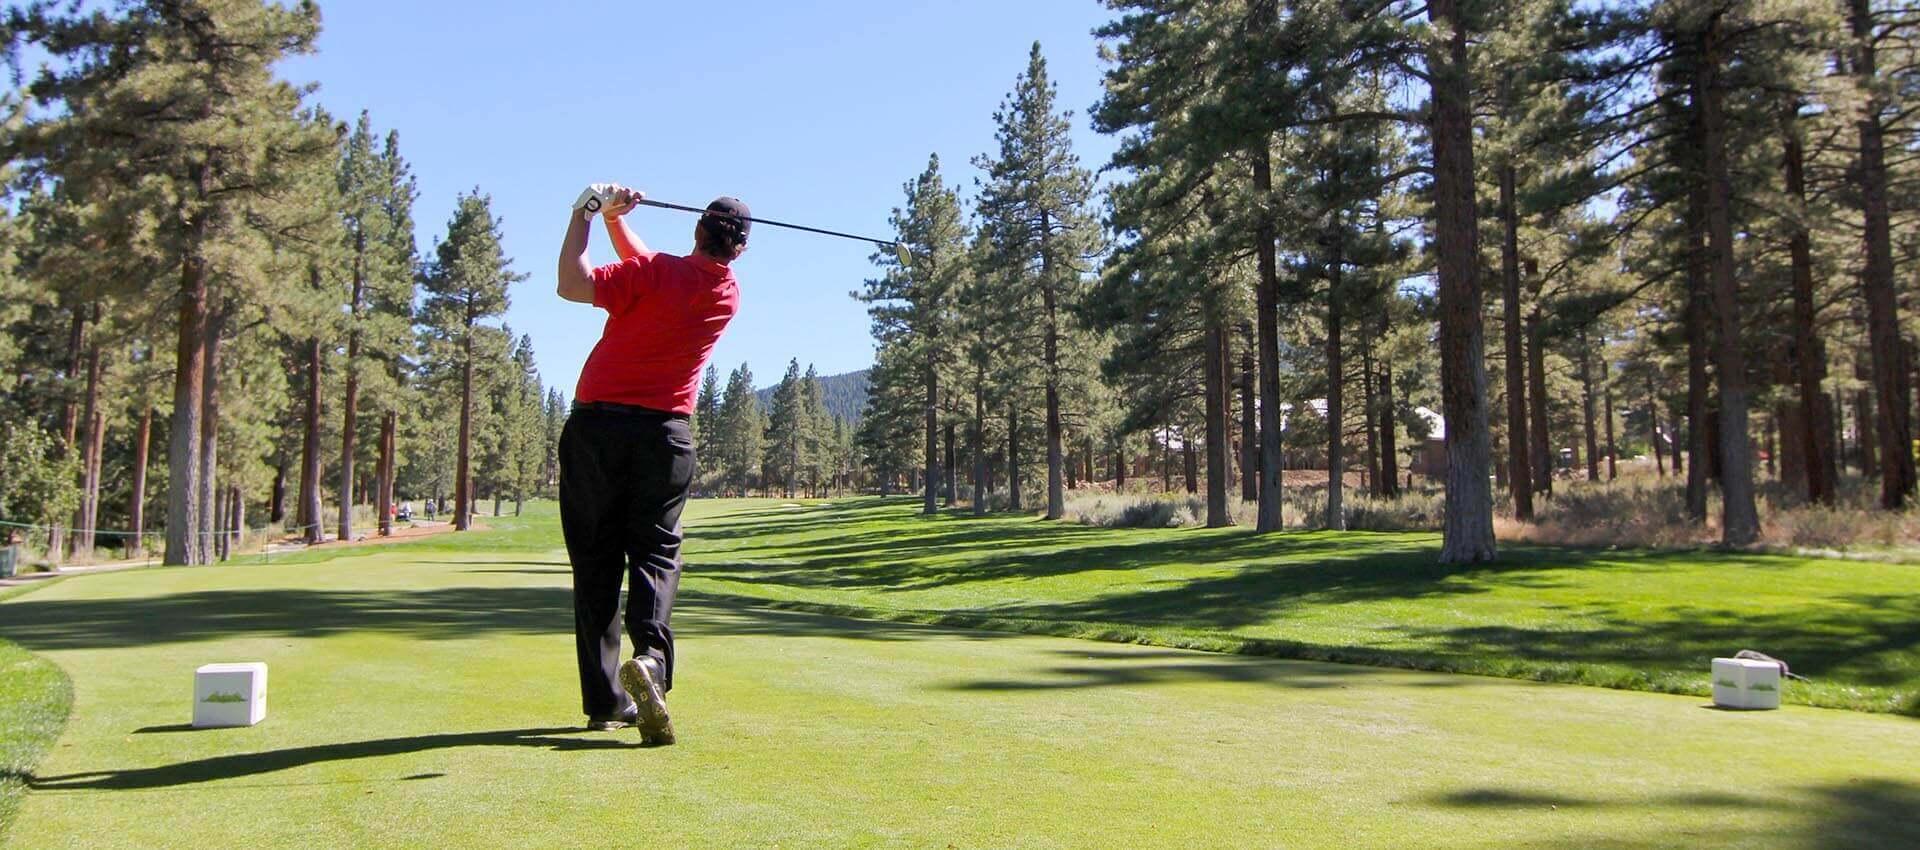 Golf, Nevada Golf, Northern Nevada Golf